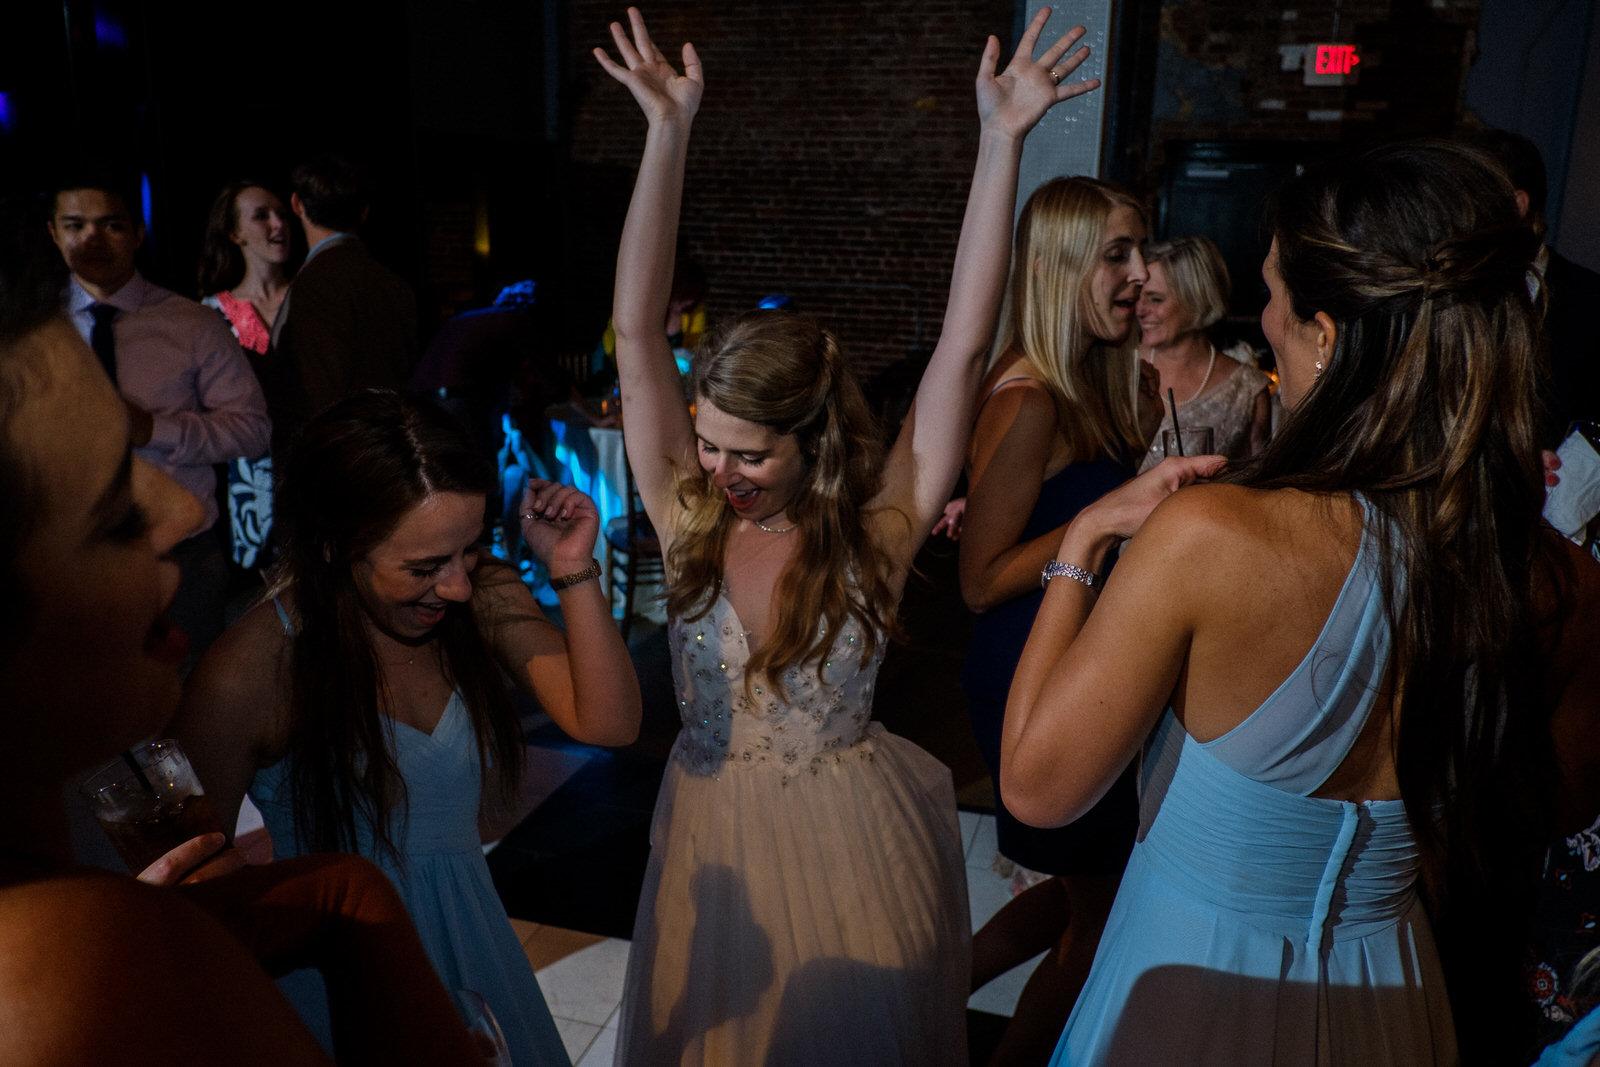 Oxford_Mississippi_wedding_photographer_40.JPG